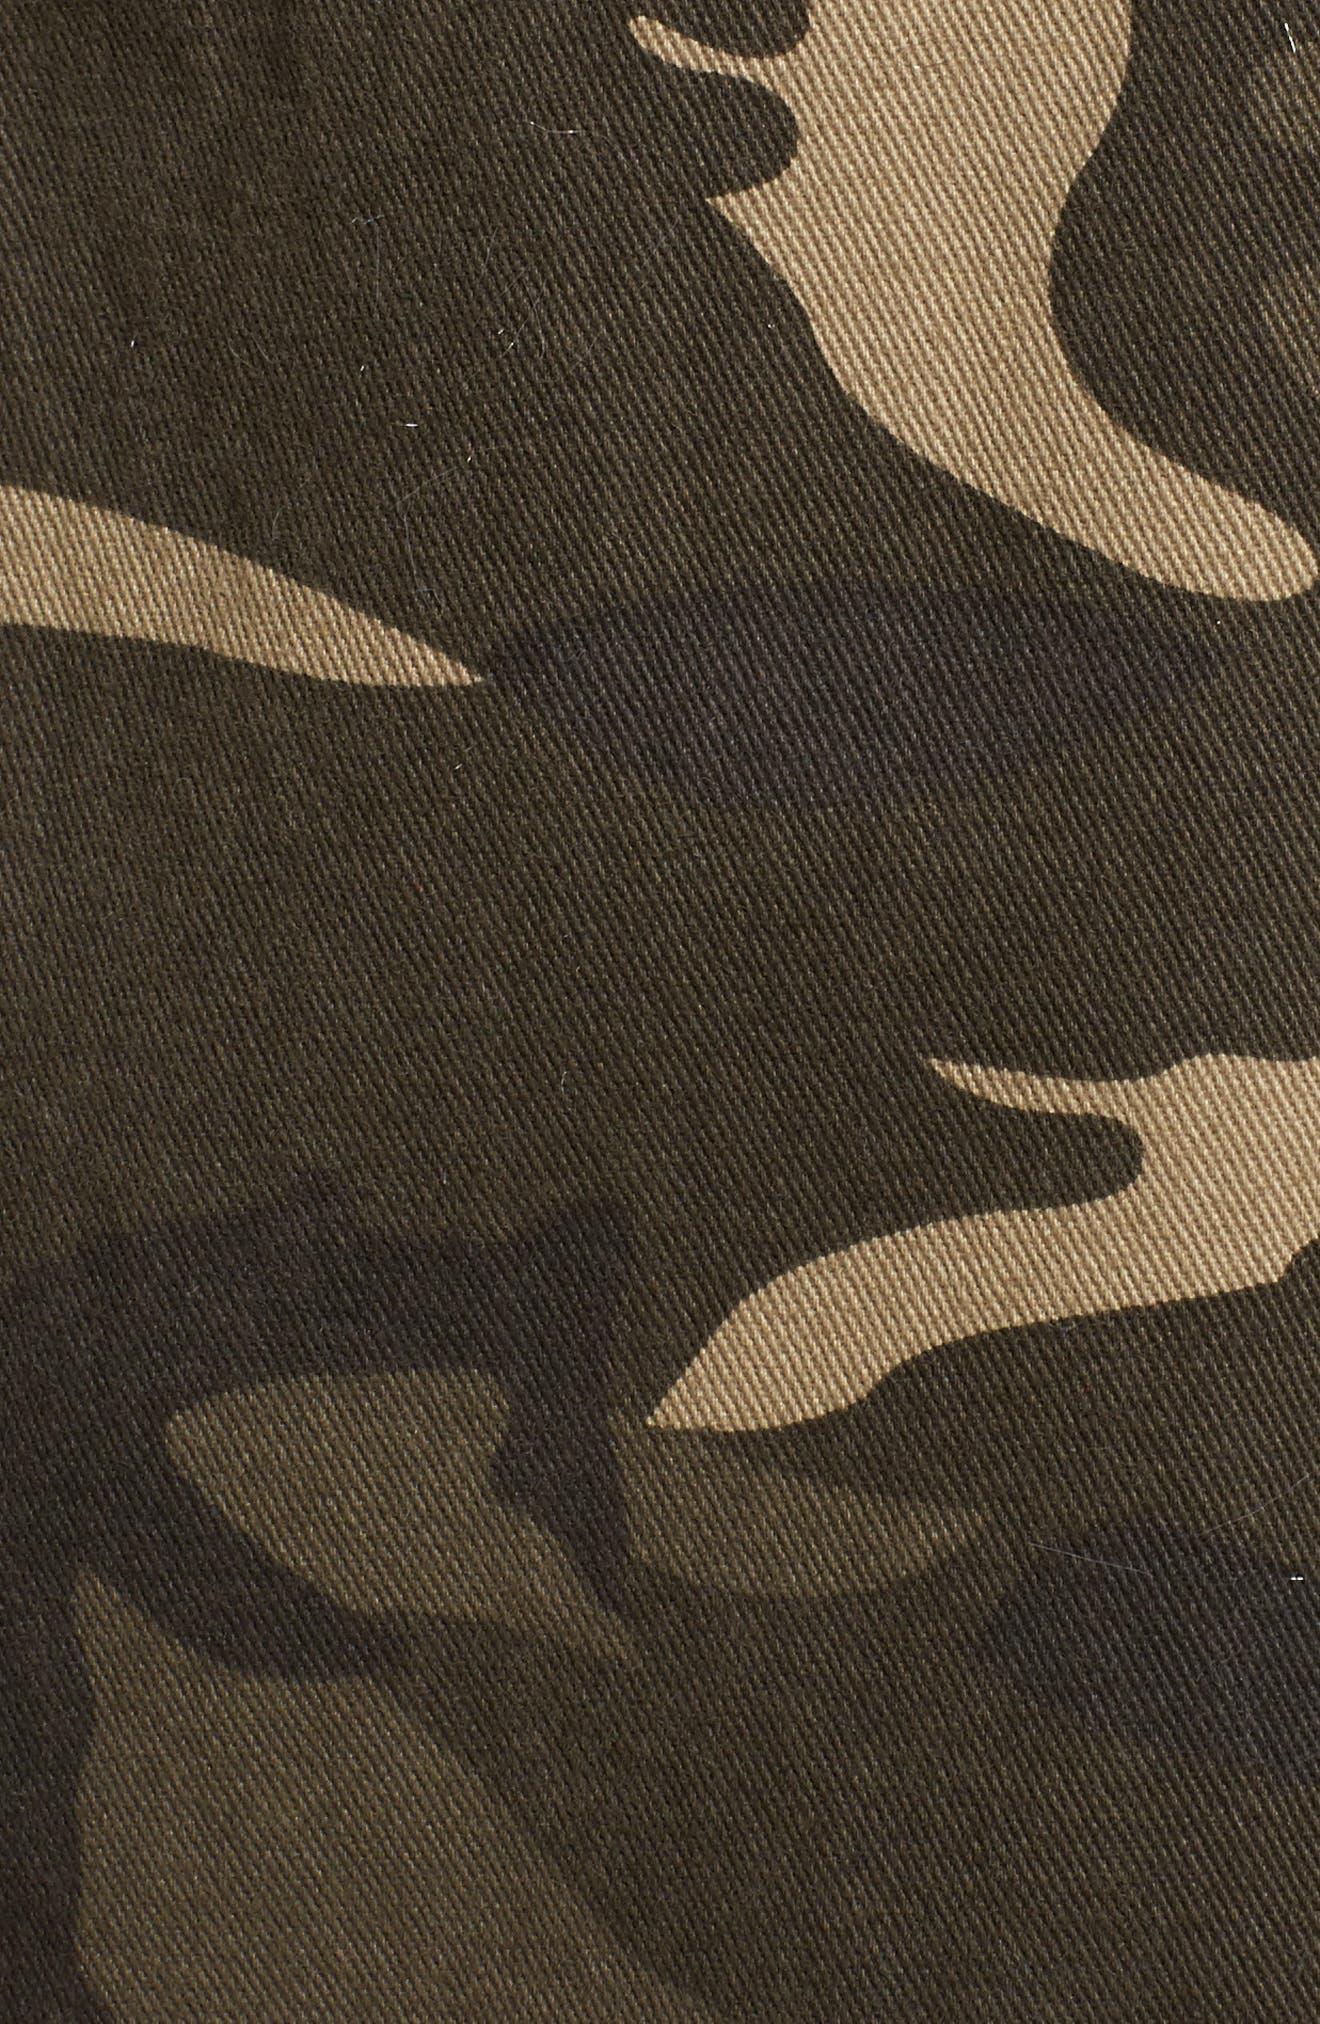 Camo Jacket,                             Alternate thumbnail 5, color,                             Graphite Olive